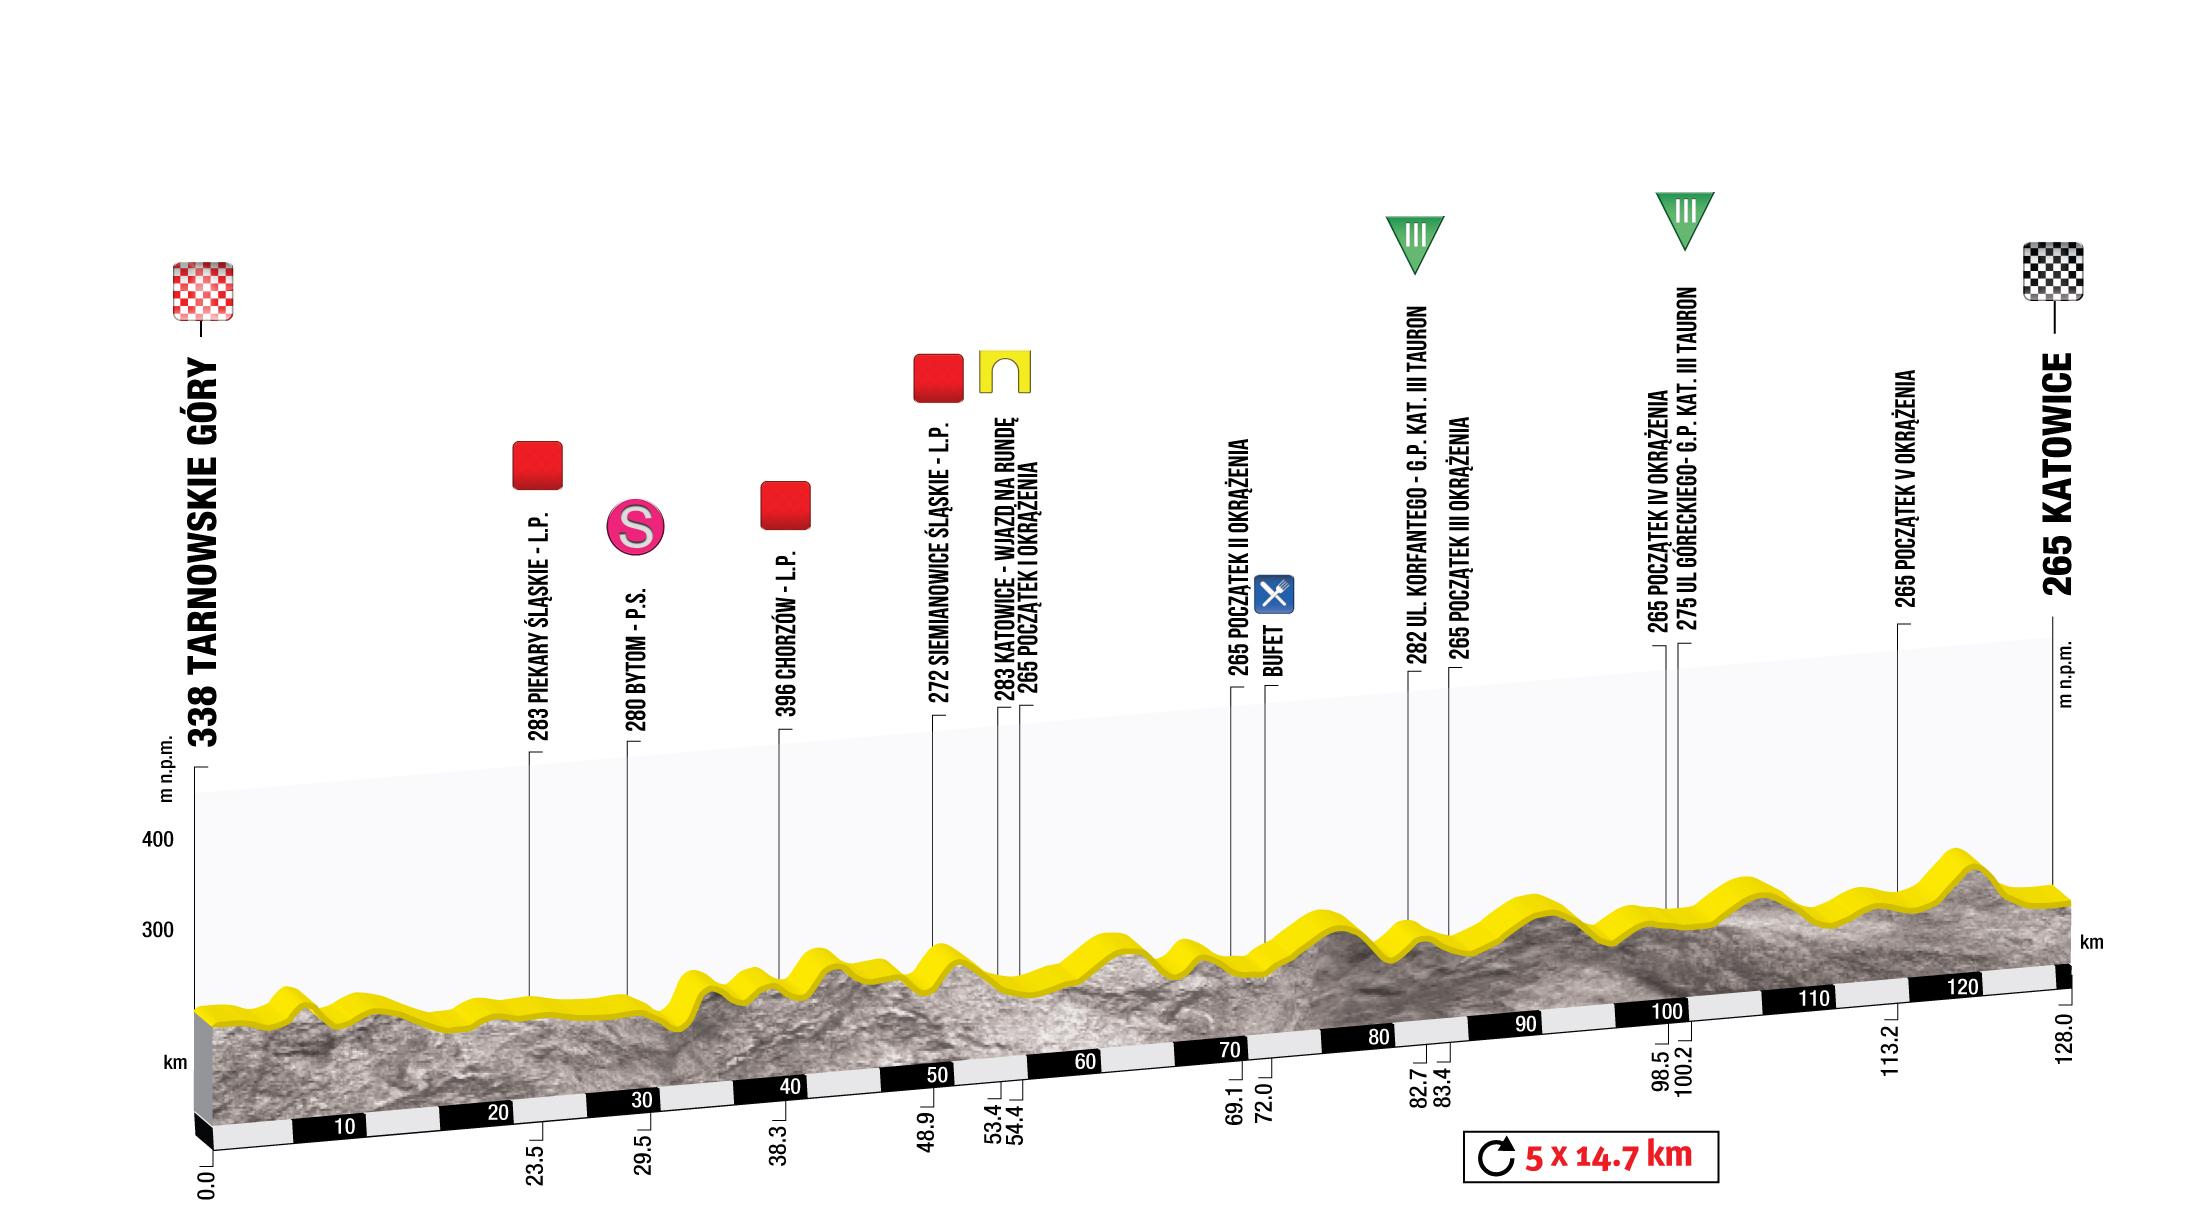 wys_etap2_TdP_UCI_WorldTour